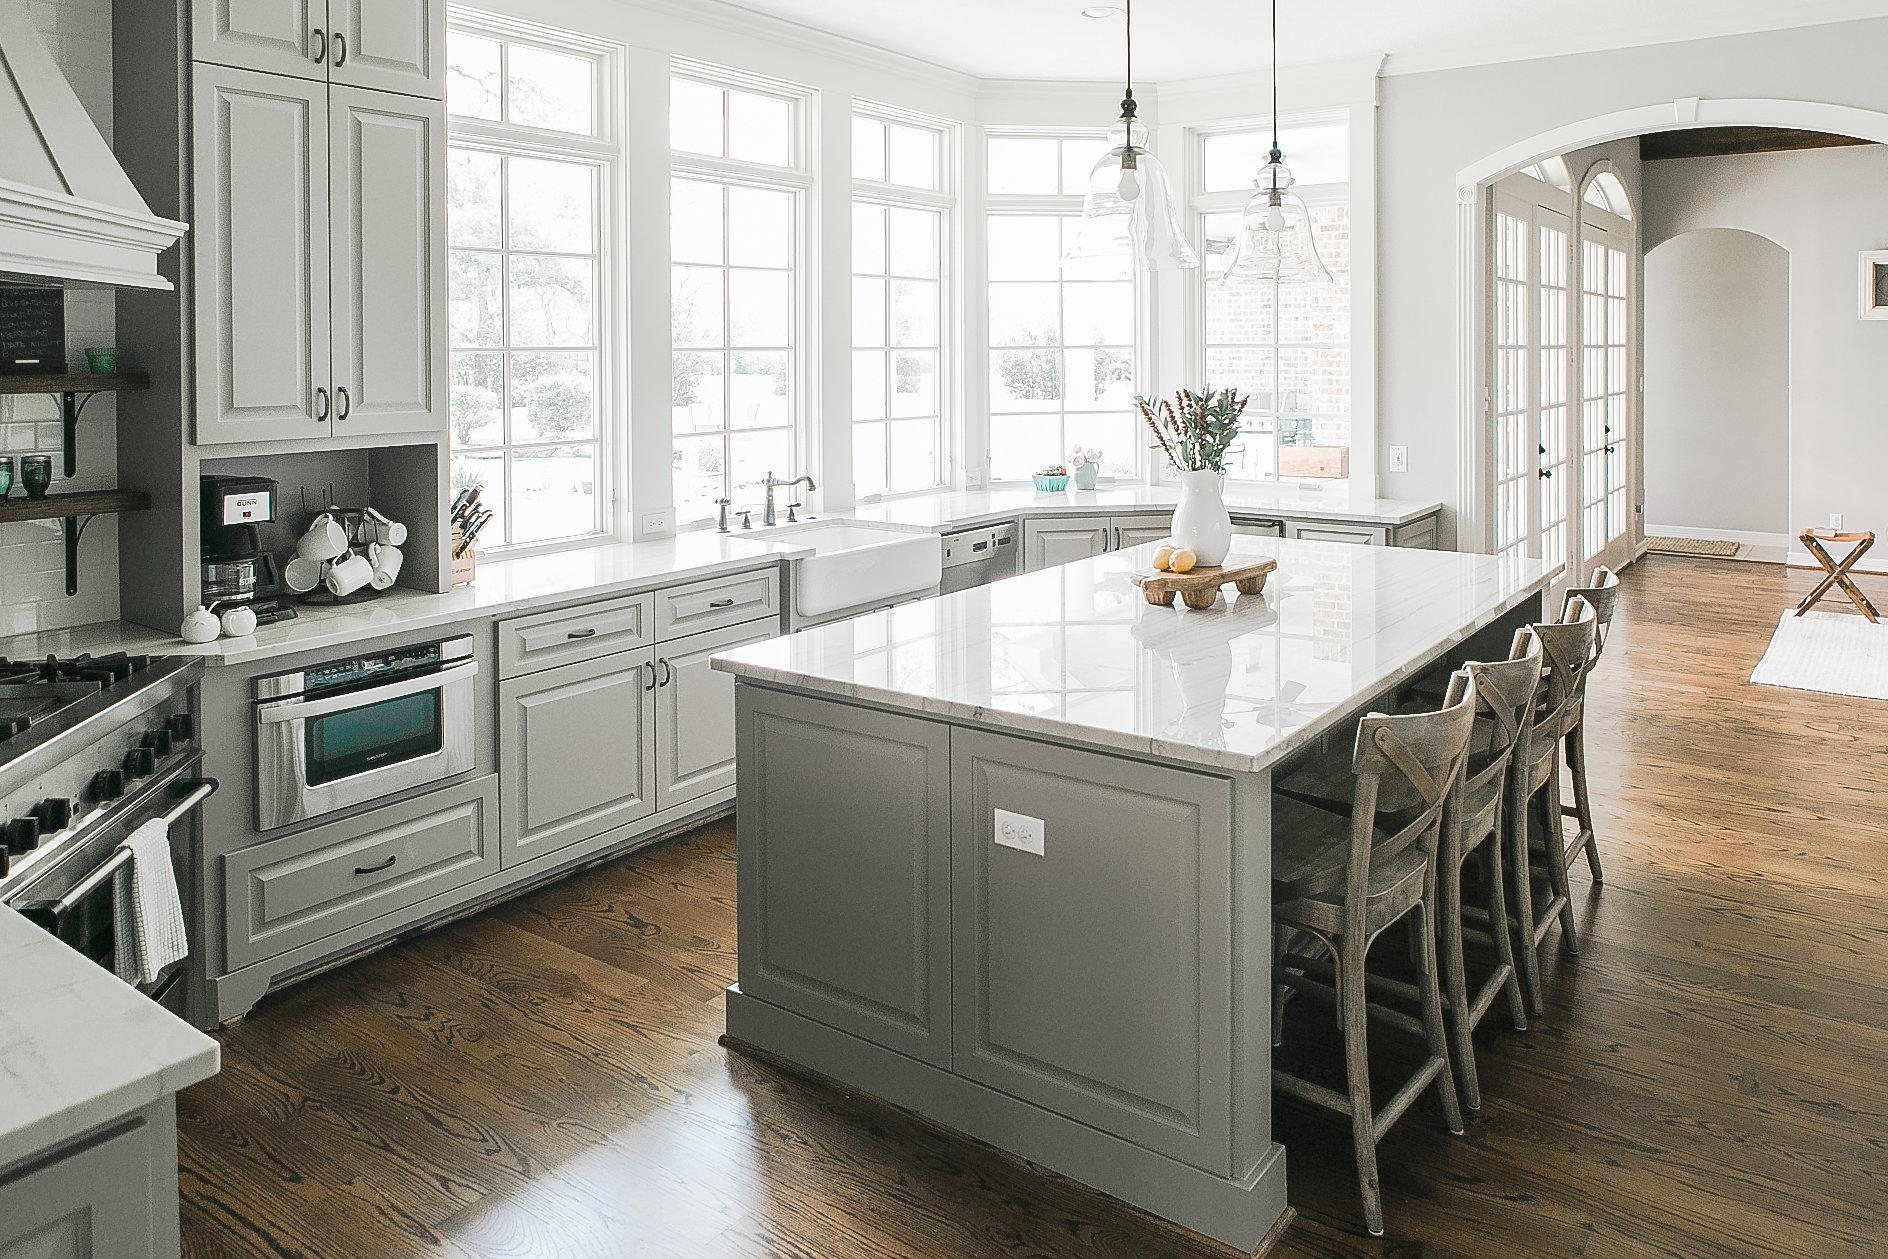 Tomball renovation sparks new interior design career